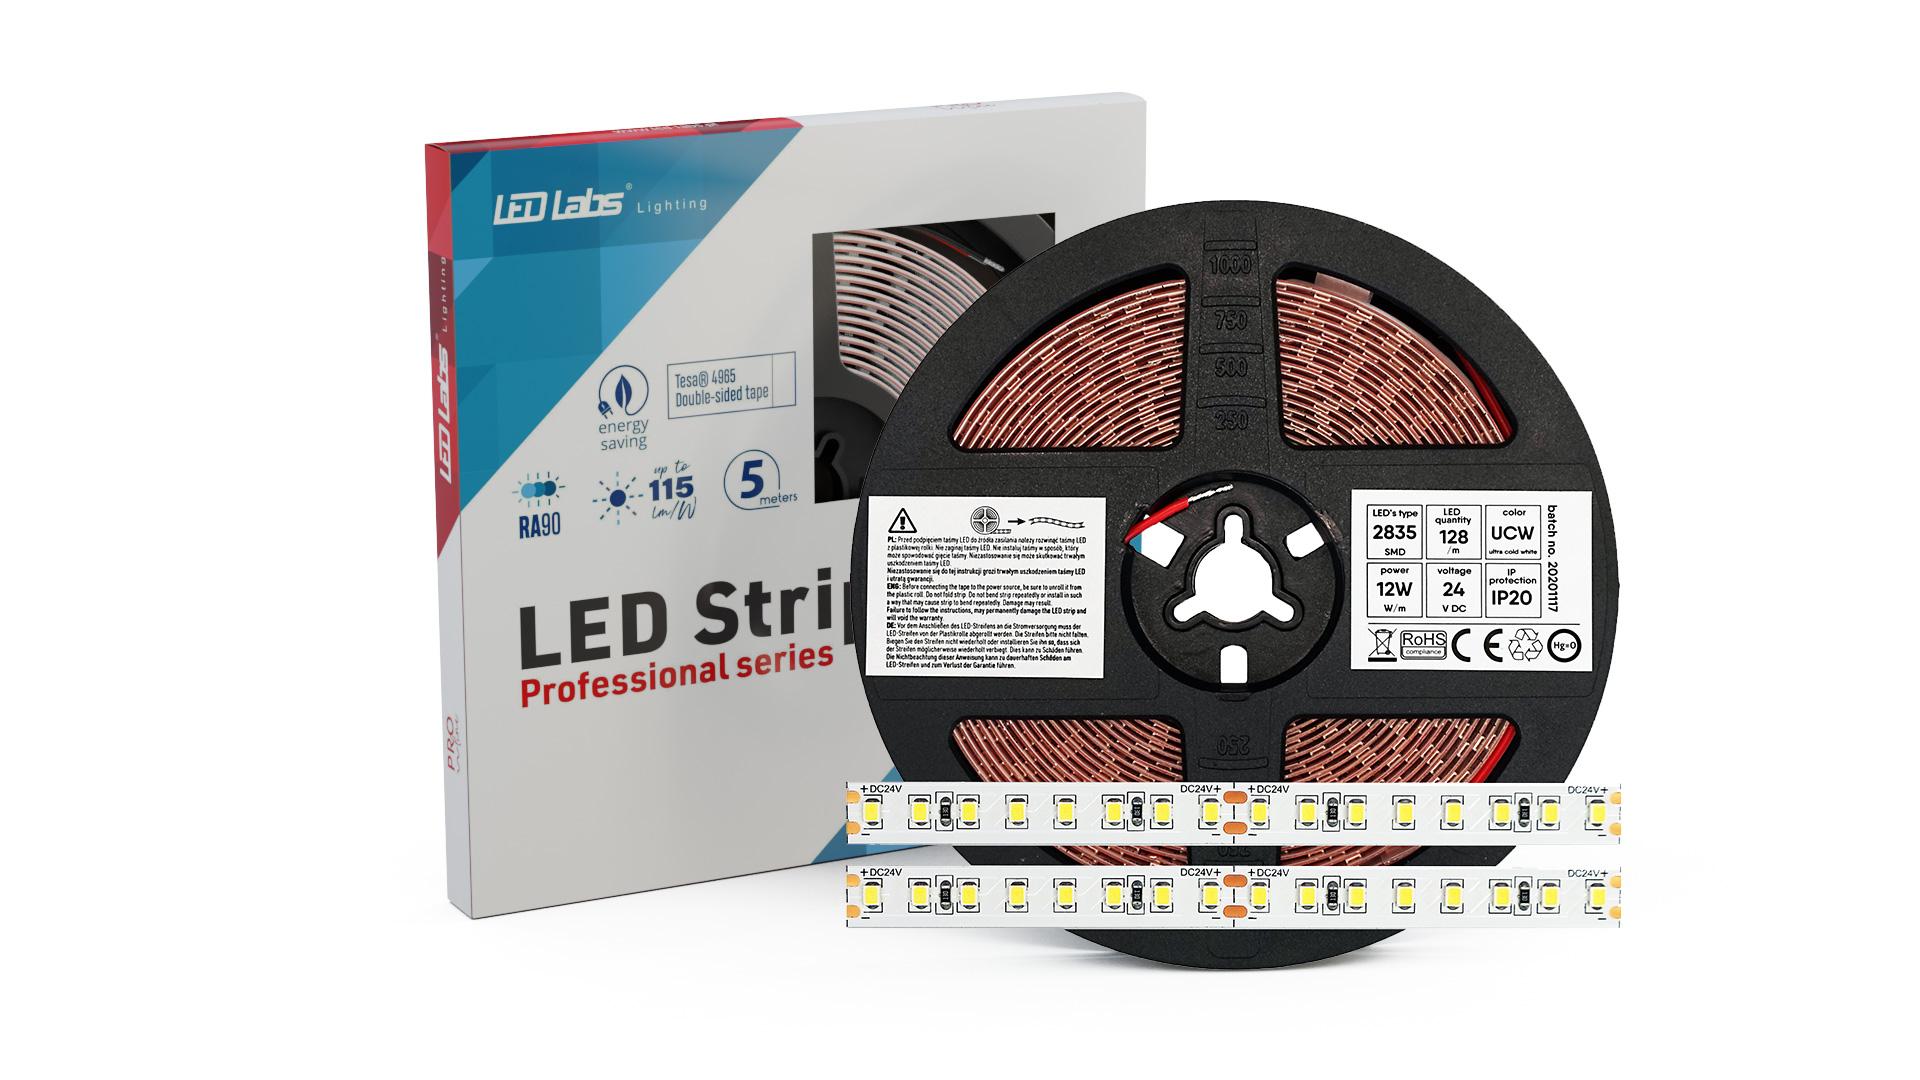 LED Strip PRO 5Y 24V 640 LED 2835 SMD 12W 3000K RA90